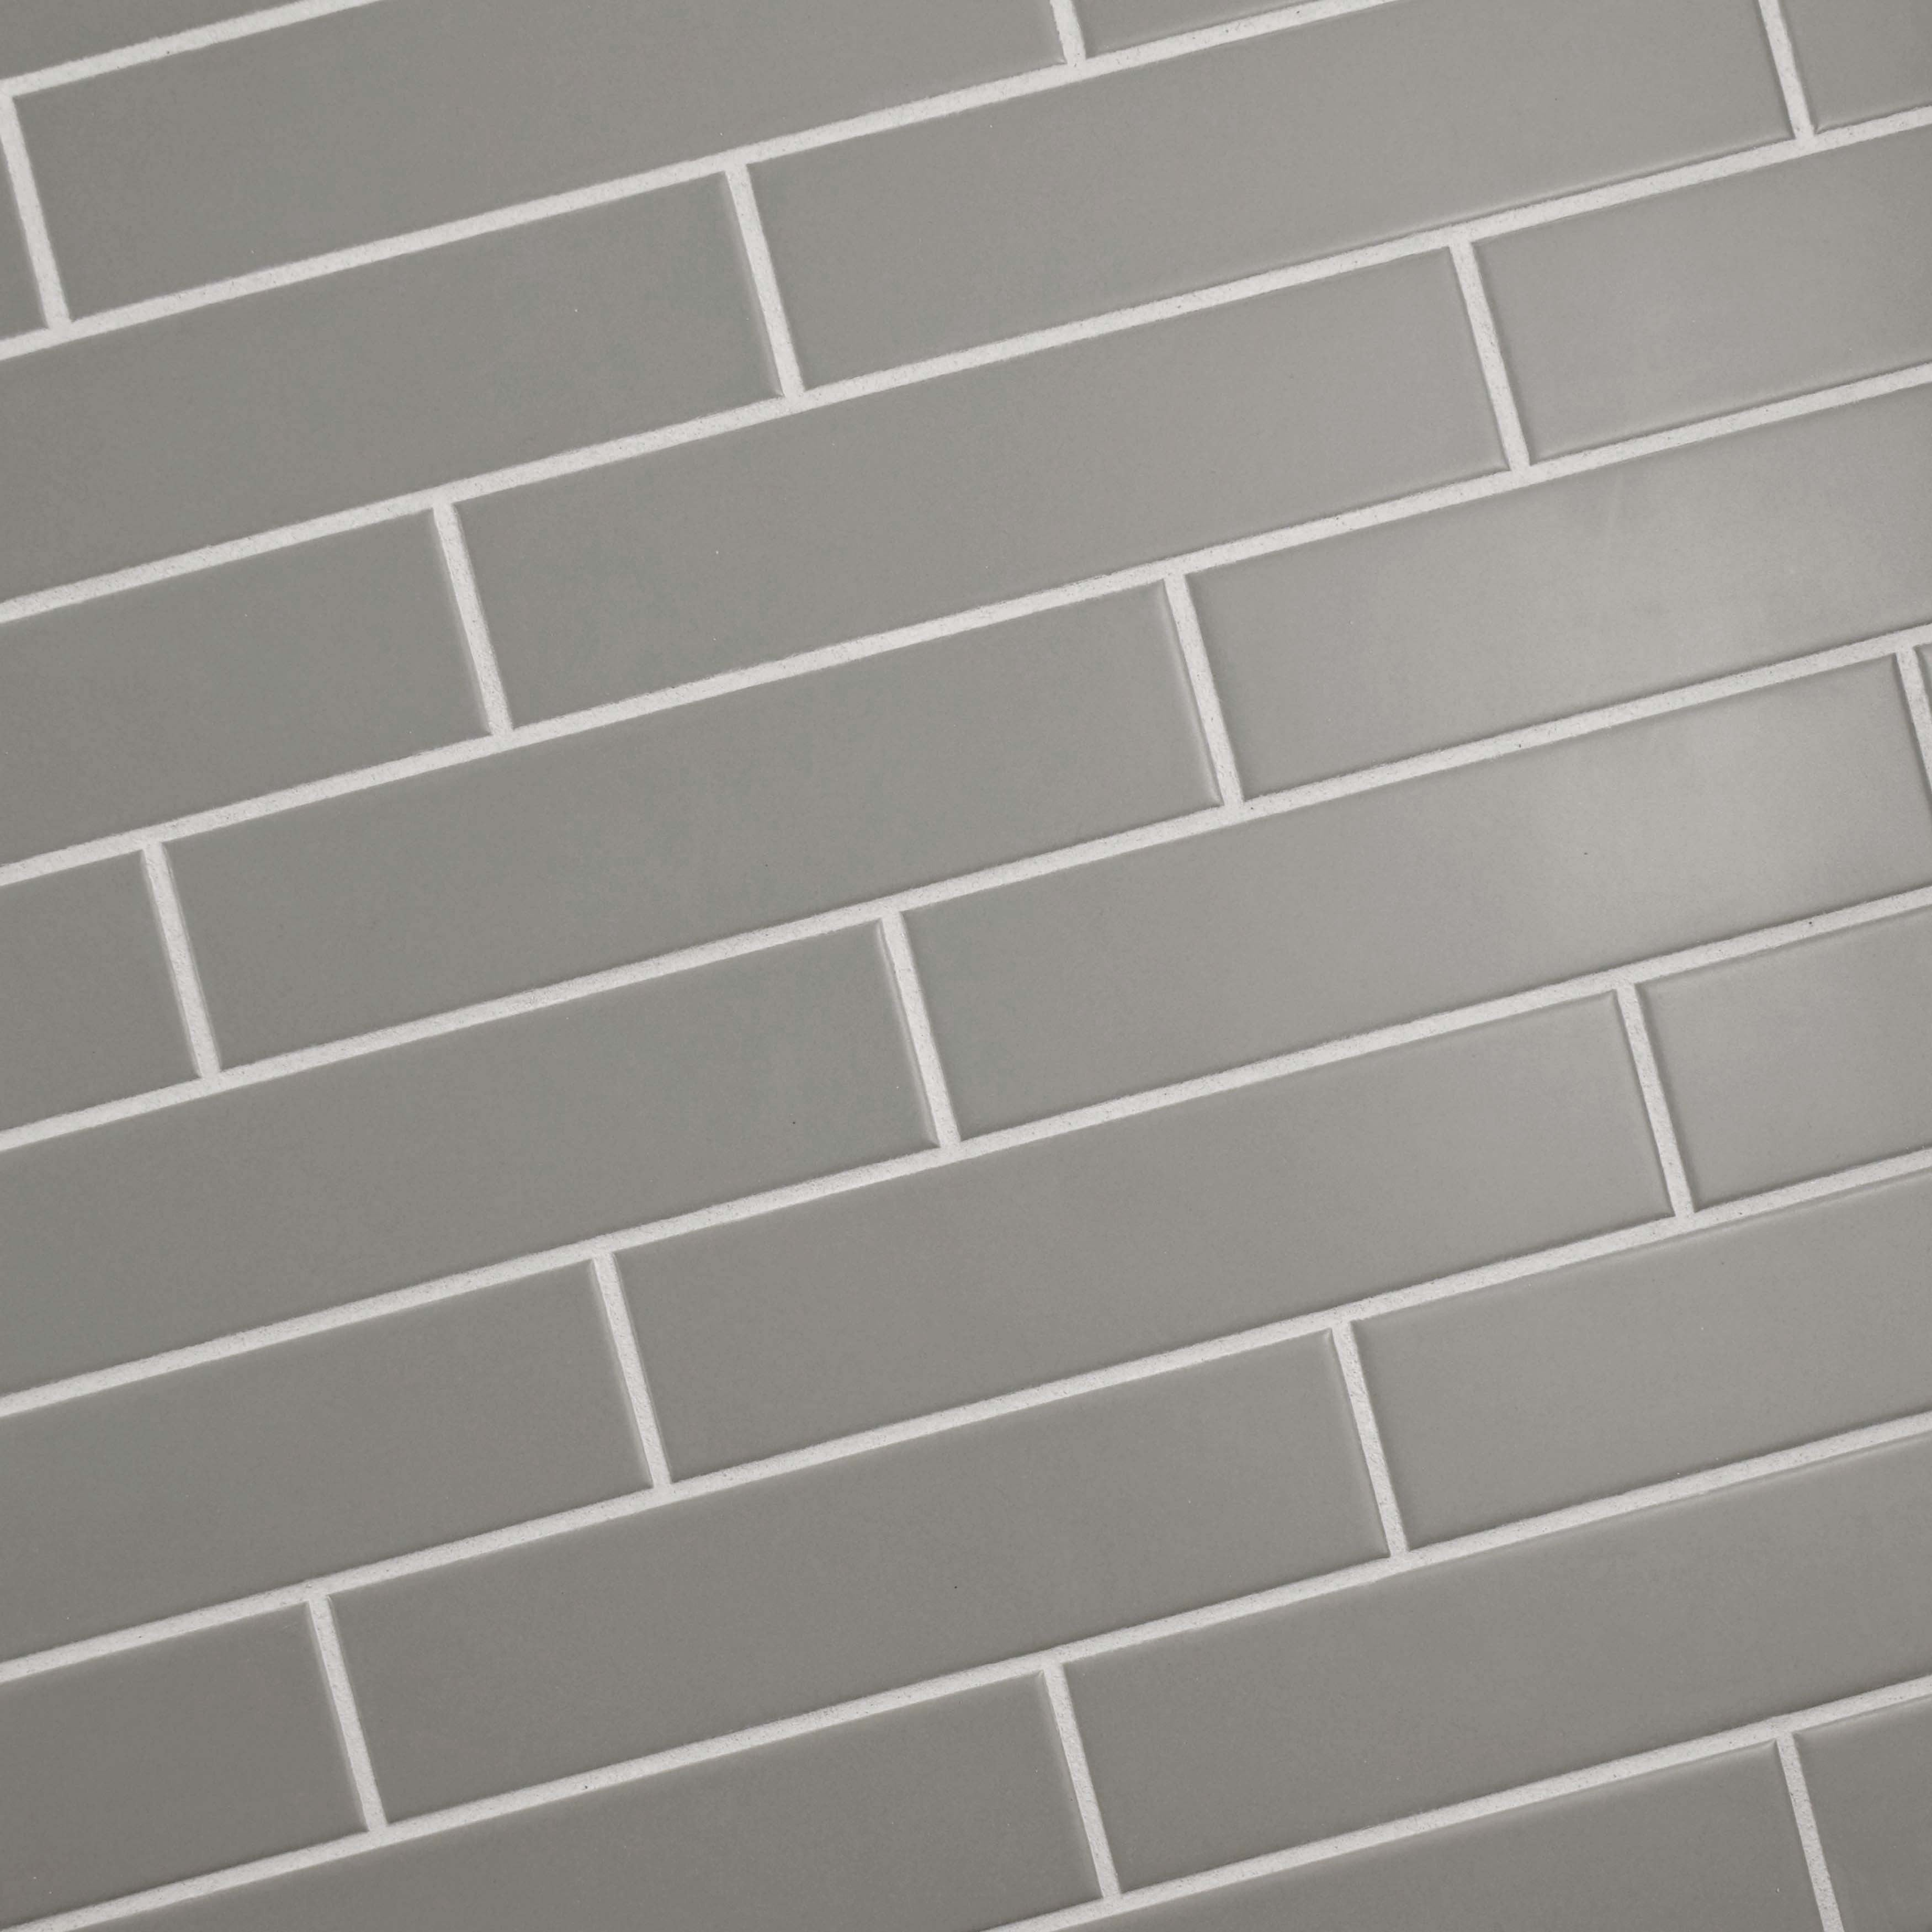 Somertile 1 75x7 75 Inch Victorian Soho Subway Matte Light Grey Porcelain Floor And Wall Tile 10 Tiles Sqft